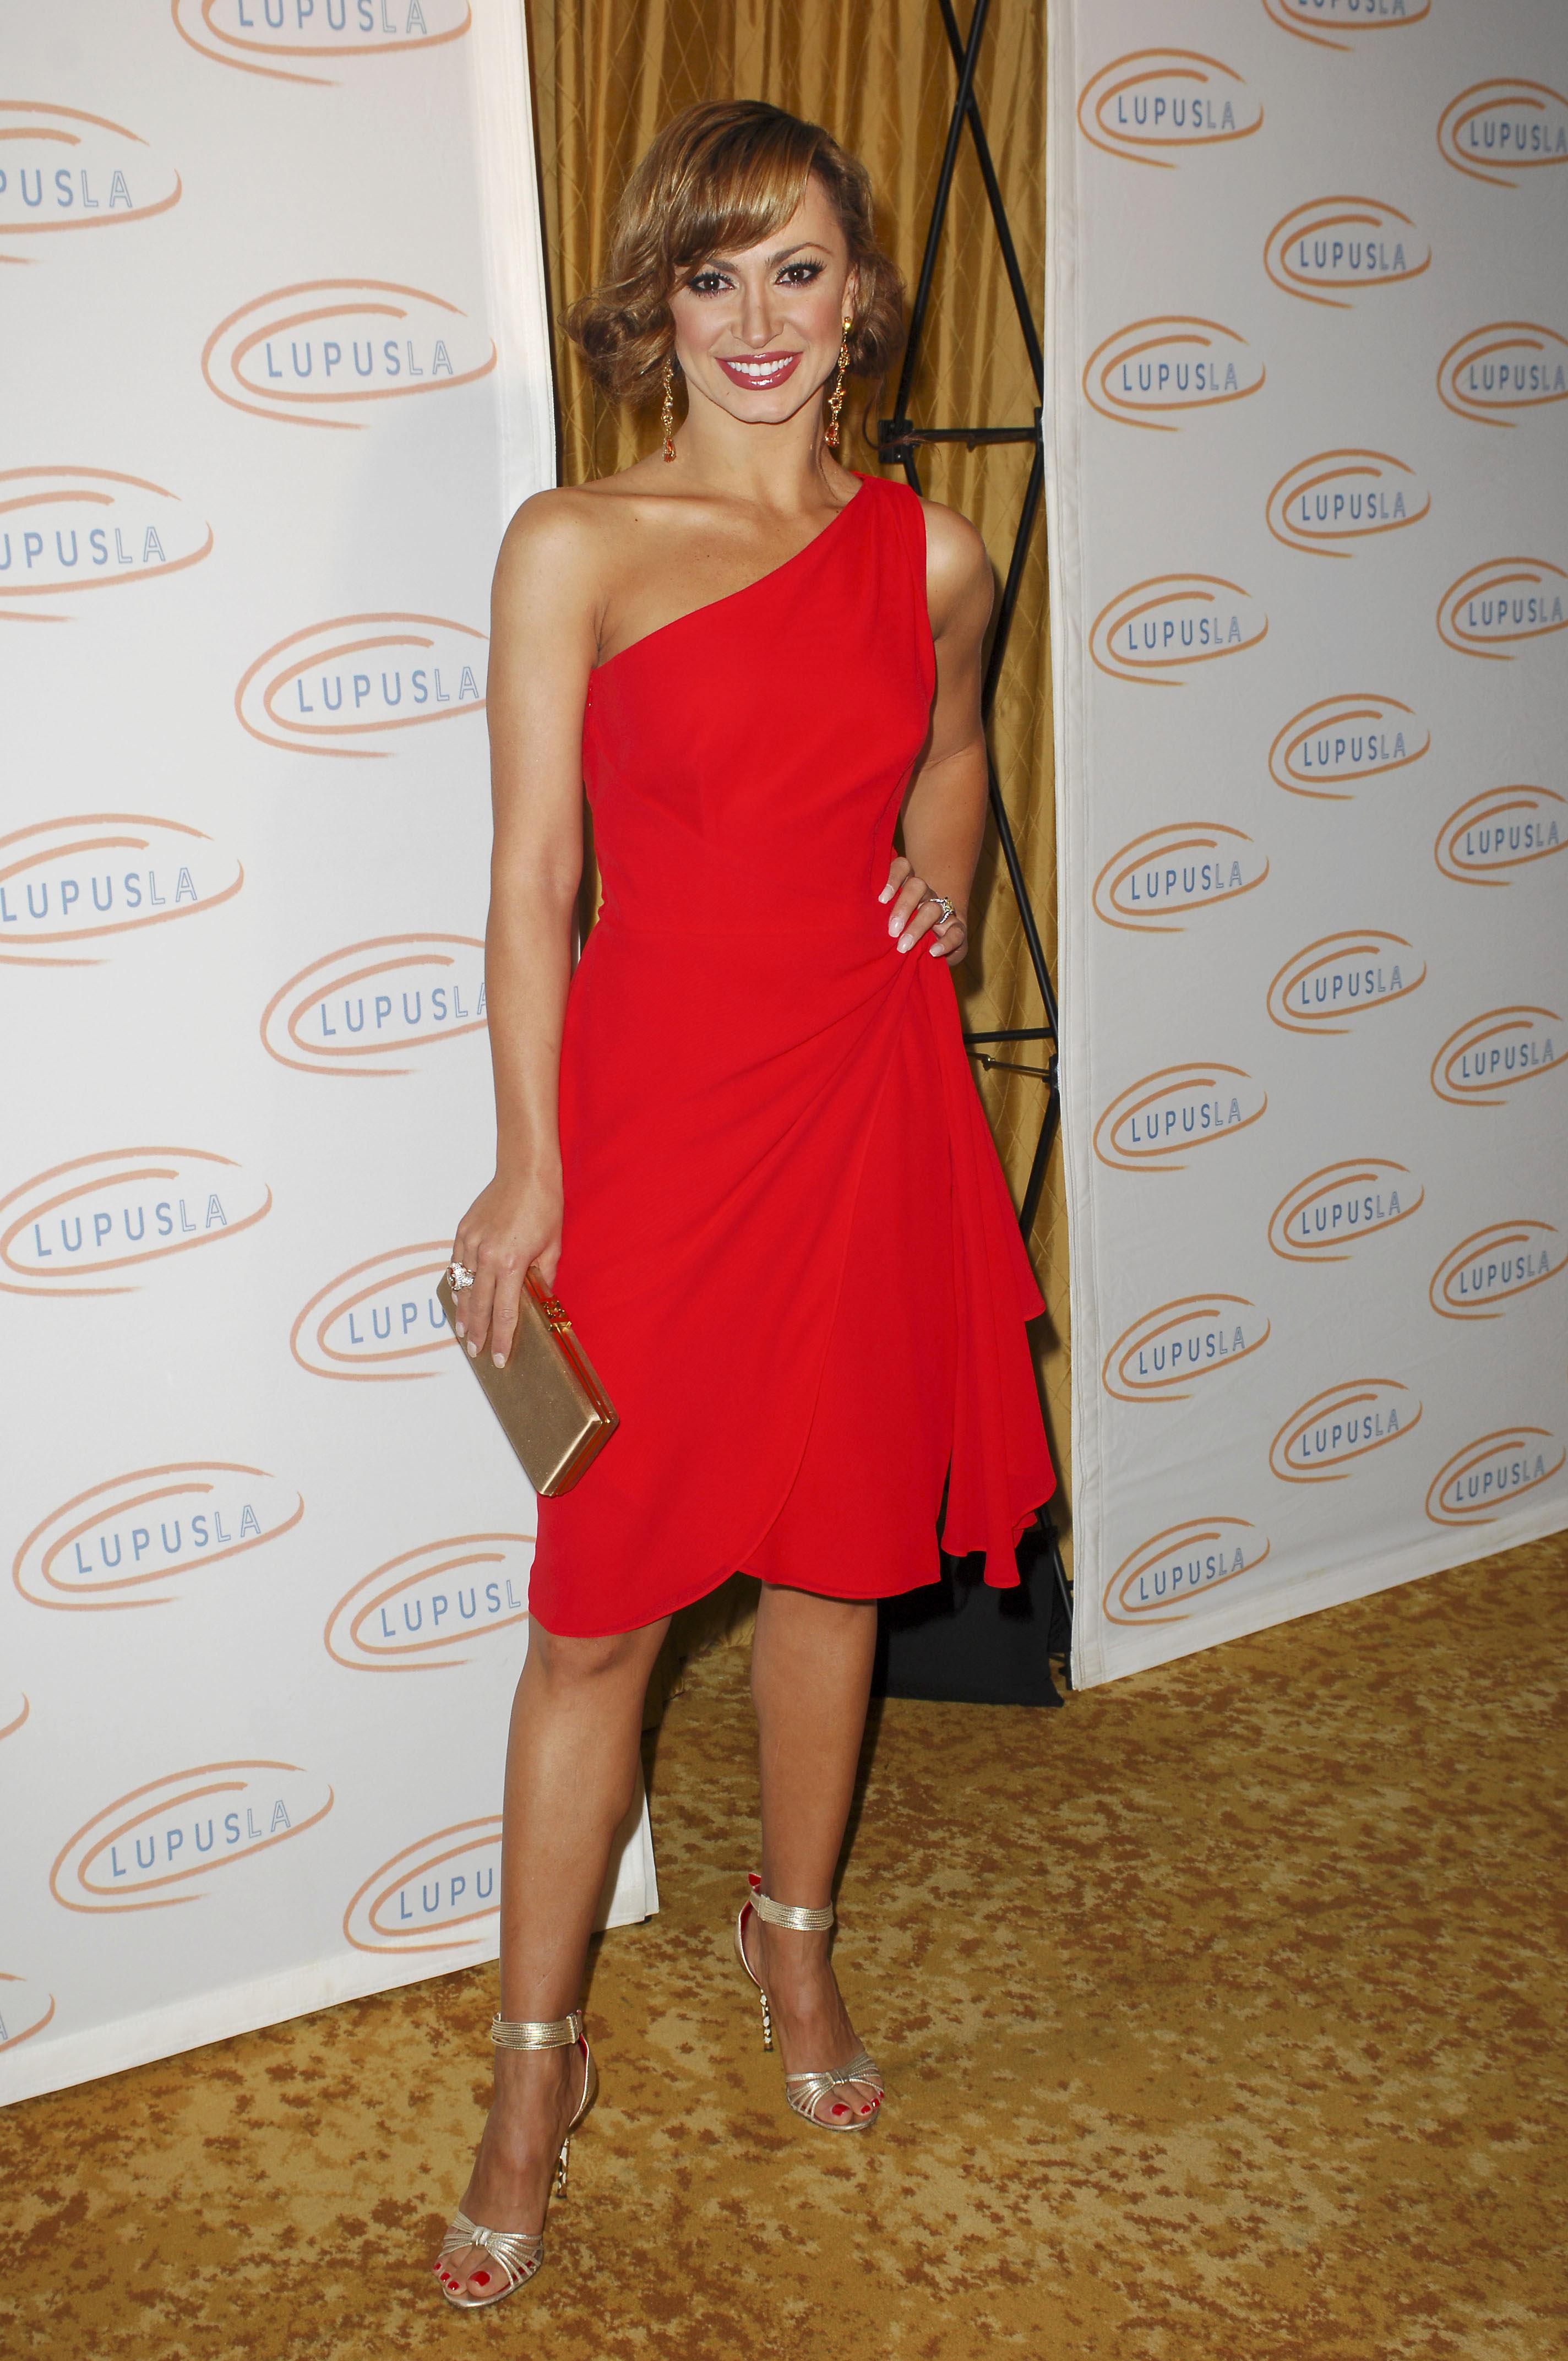 32070_Karina_Smirnoff_2008-11-07_-_Lupus_LA8s_Sixth_Annual_Hollywood_Bag_Ladies_Luncheon_in_Beverly_H_8359_122_122lo.jpg